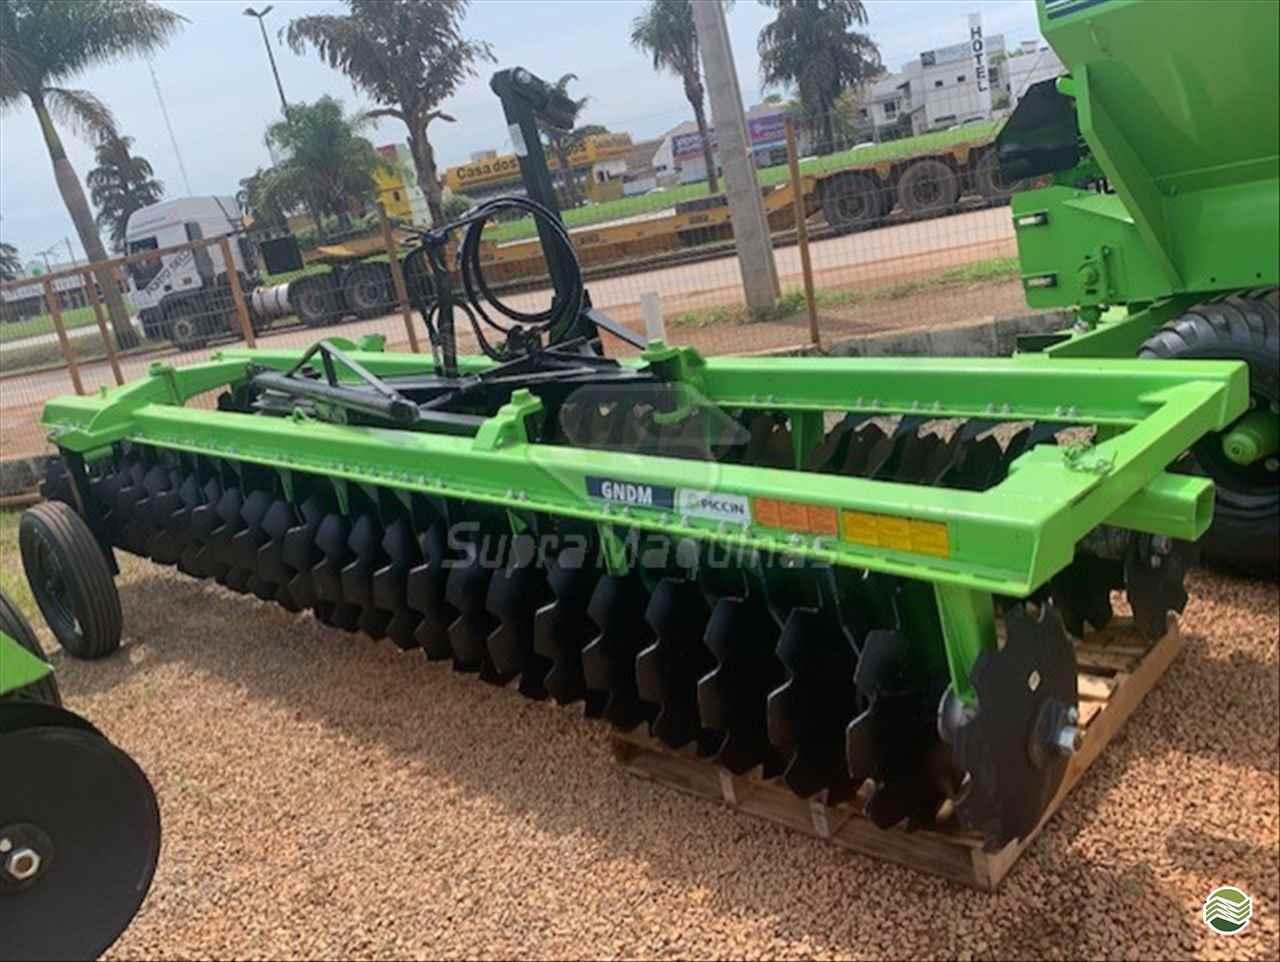 IMPLEMENTOS AGRICOLAS GRADE NIVELADORA NIVELADORA 56 DISCOS Supra Máquinas LUCAS DO RIO VERDE MATO GROSSO MT